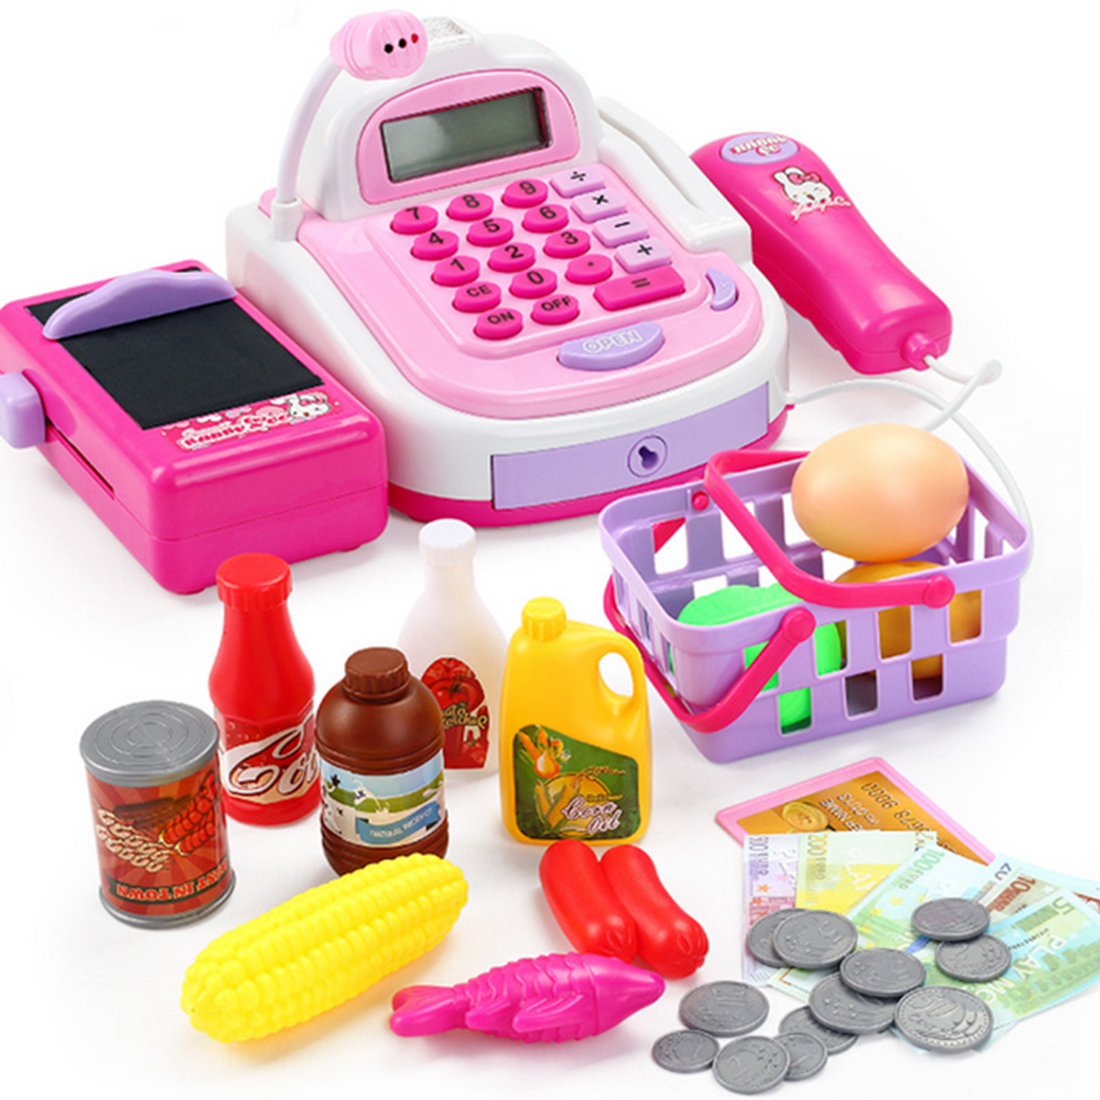 NFSTRIKE Kids Plastic Cash Register Cashier Pretend & Play C